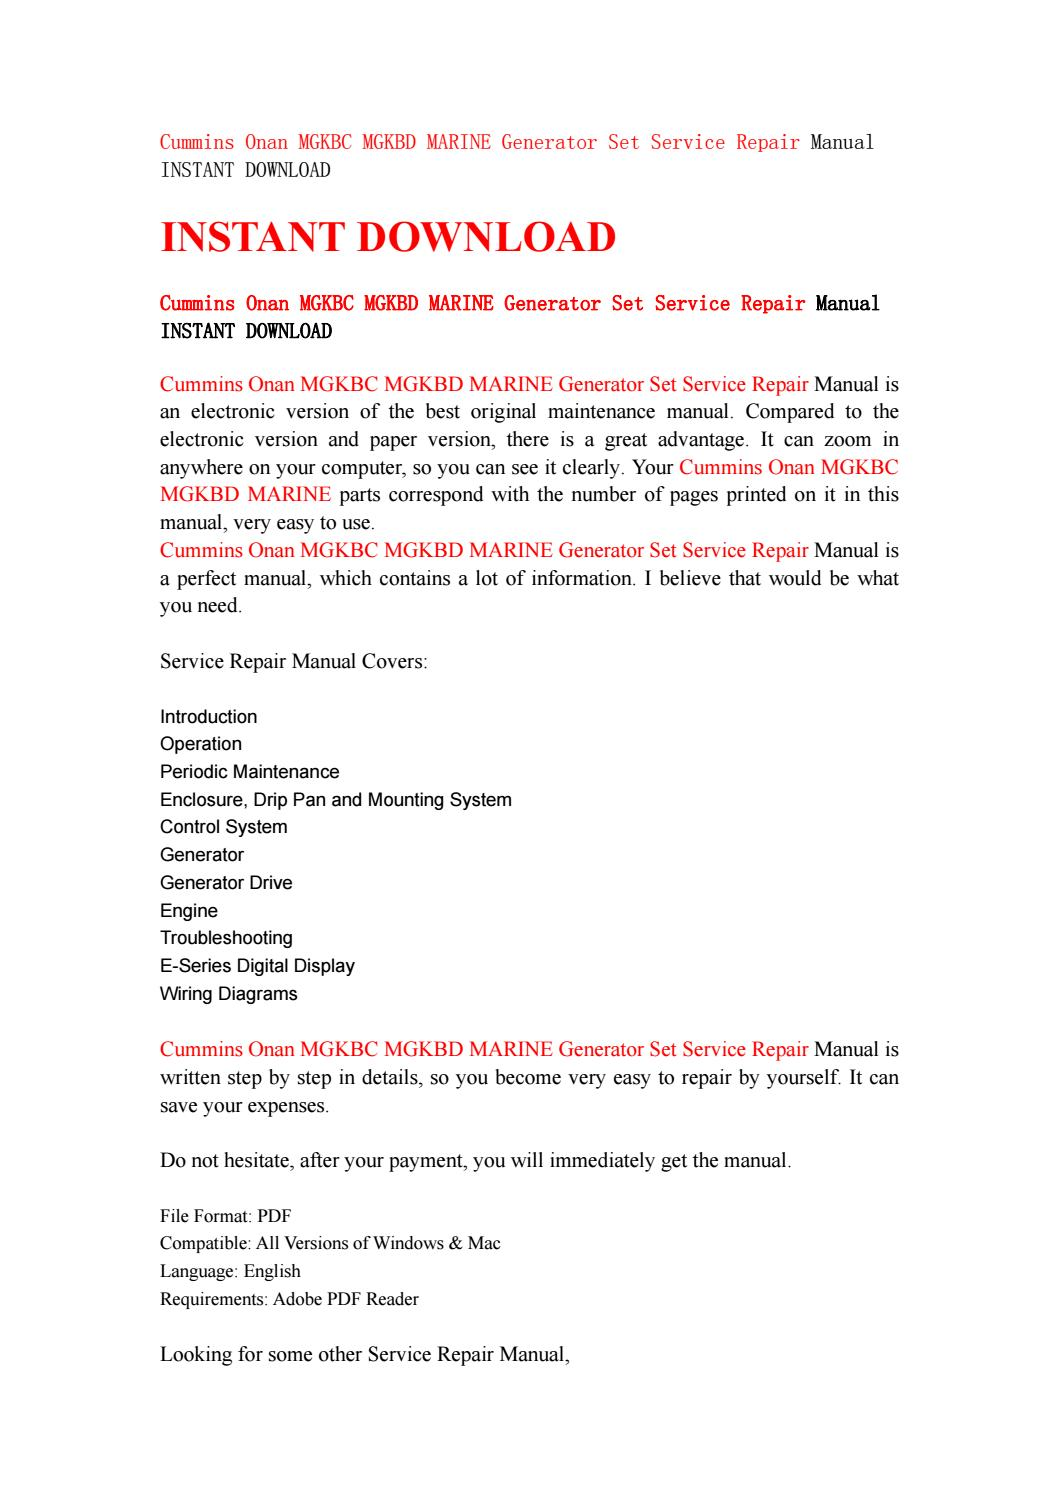 cummins onan mgkbc mgkbd marine generator set service repair manual